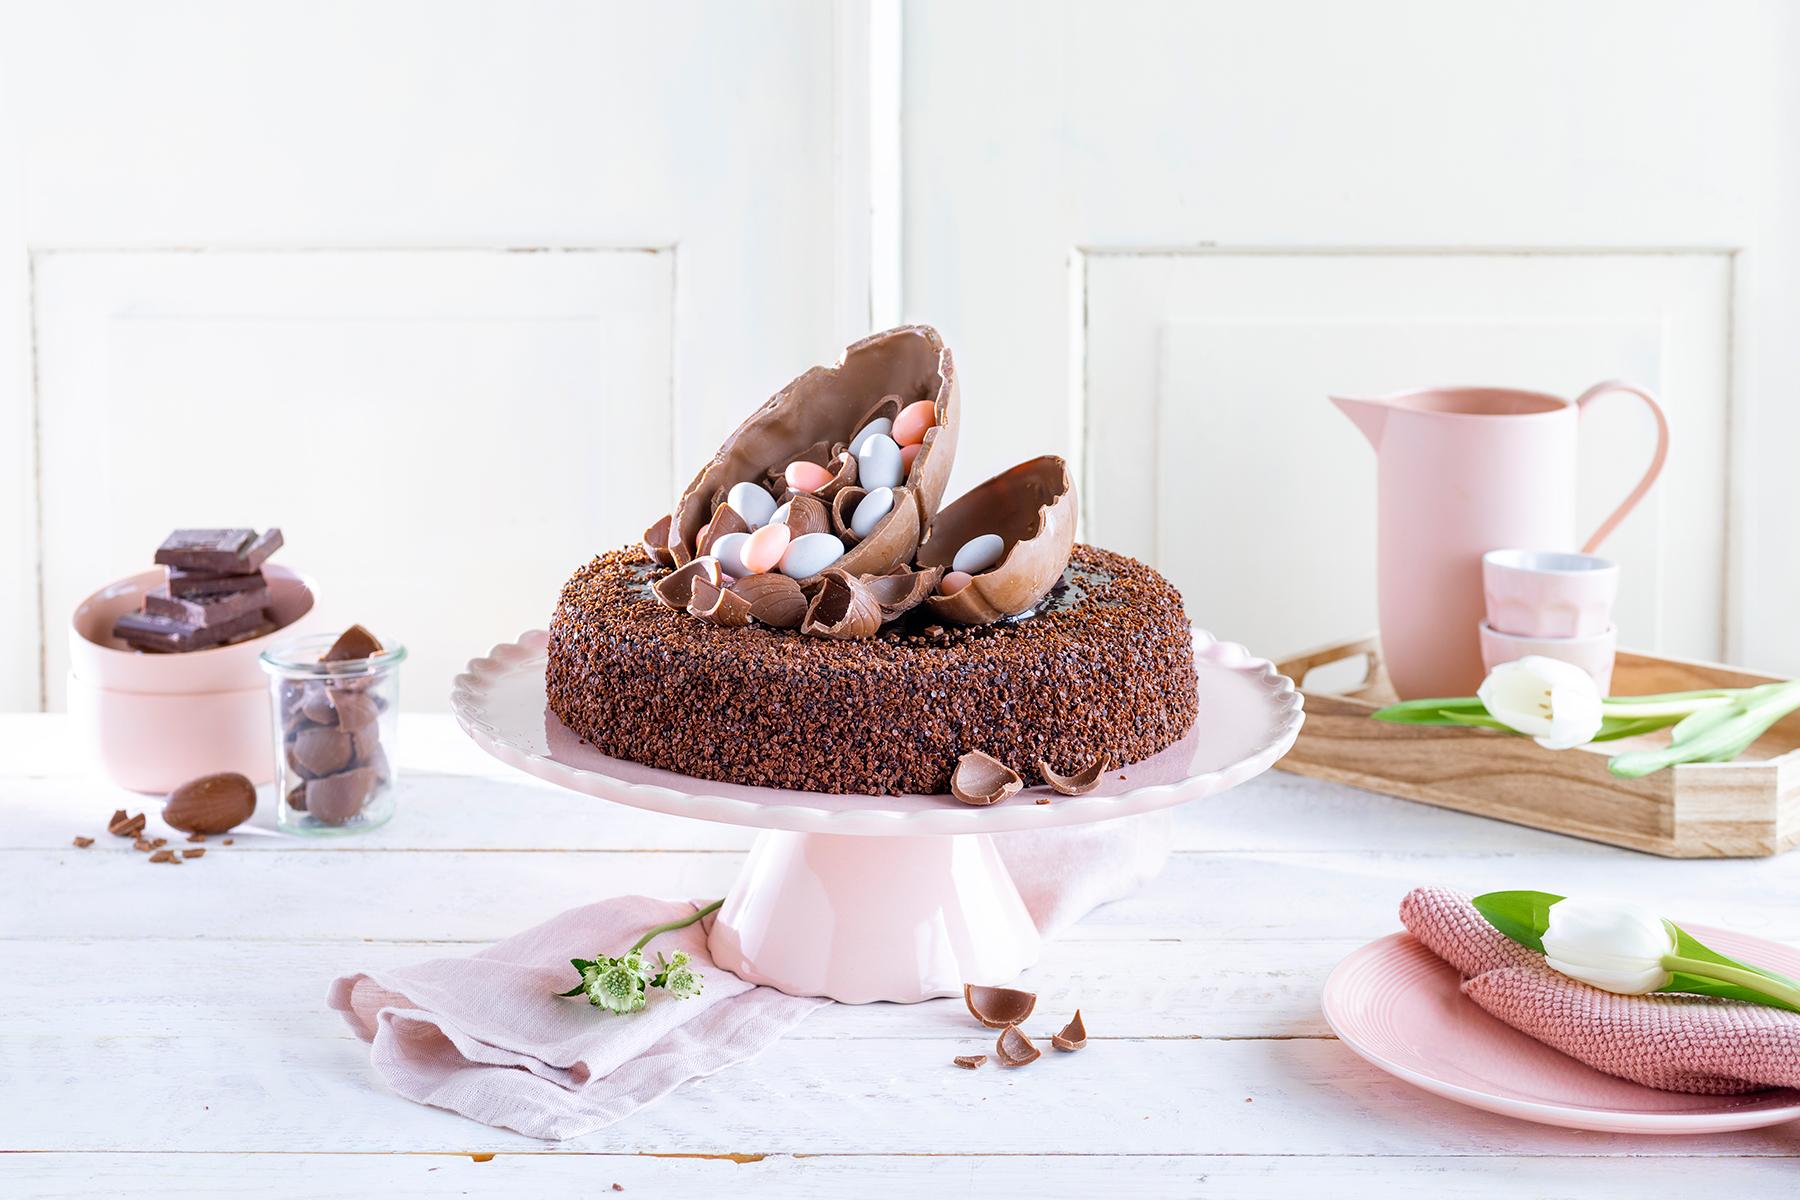 Startseite [Kuchenkult] 20